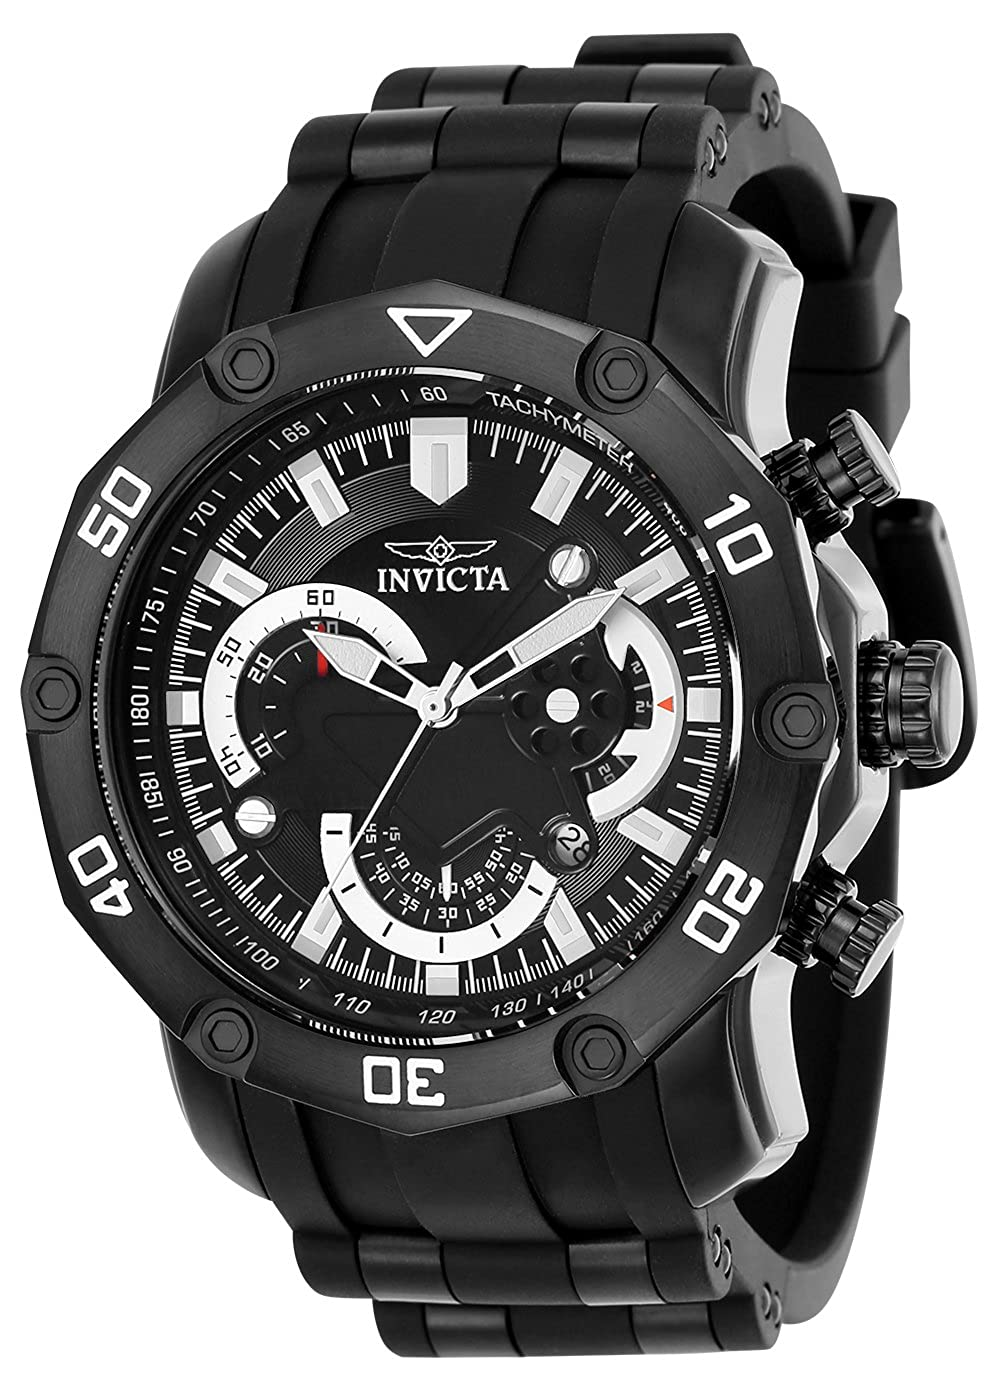 Invicta Men s Pro Diver Stainless Steel Quartz Watch with Silicone Strap, Black, 0.95 Model 22799